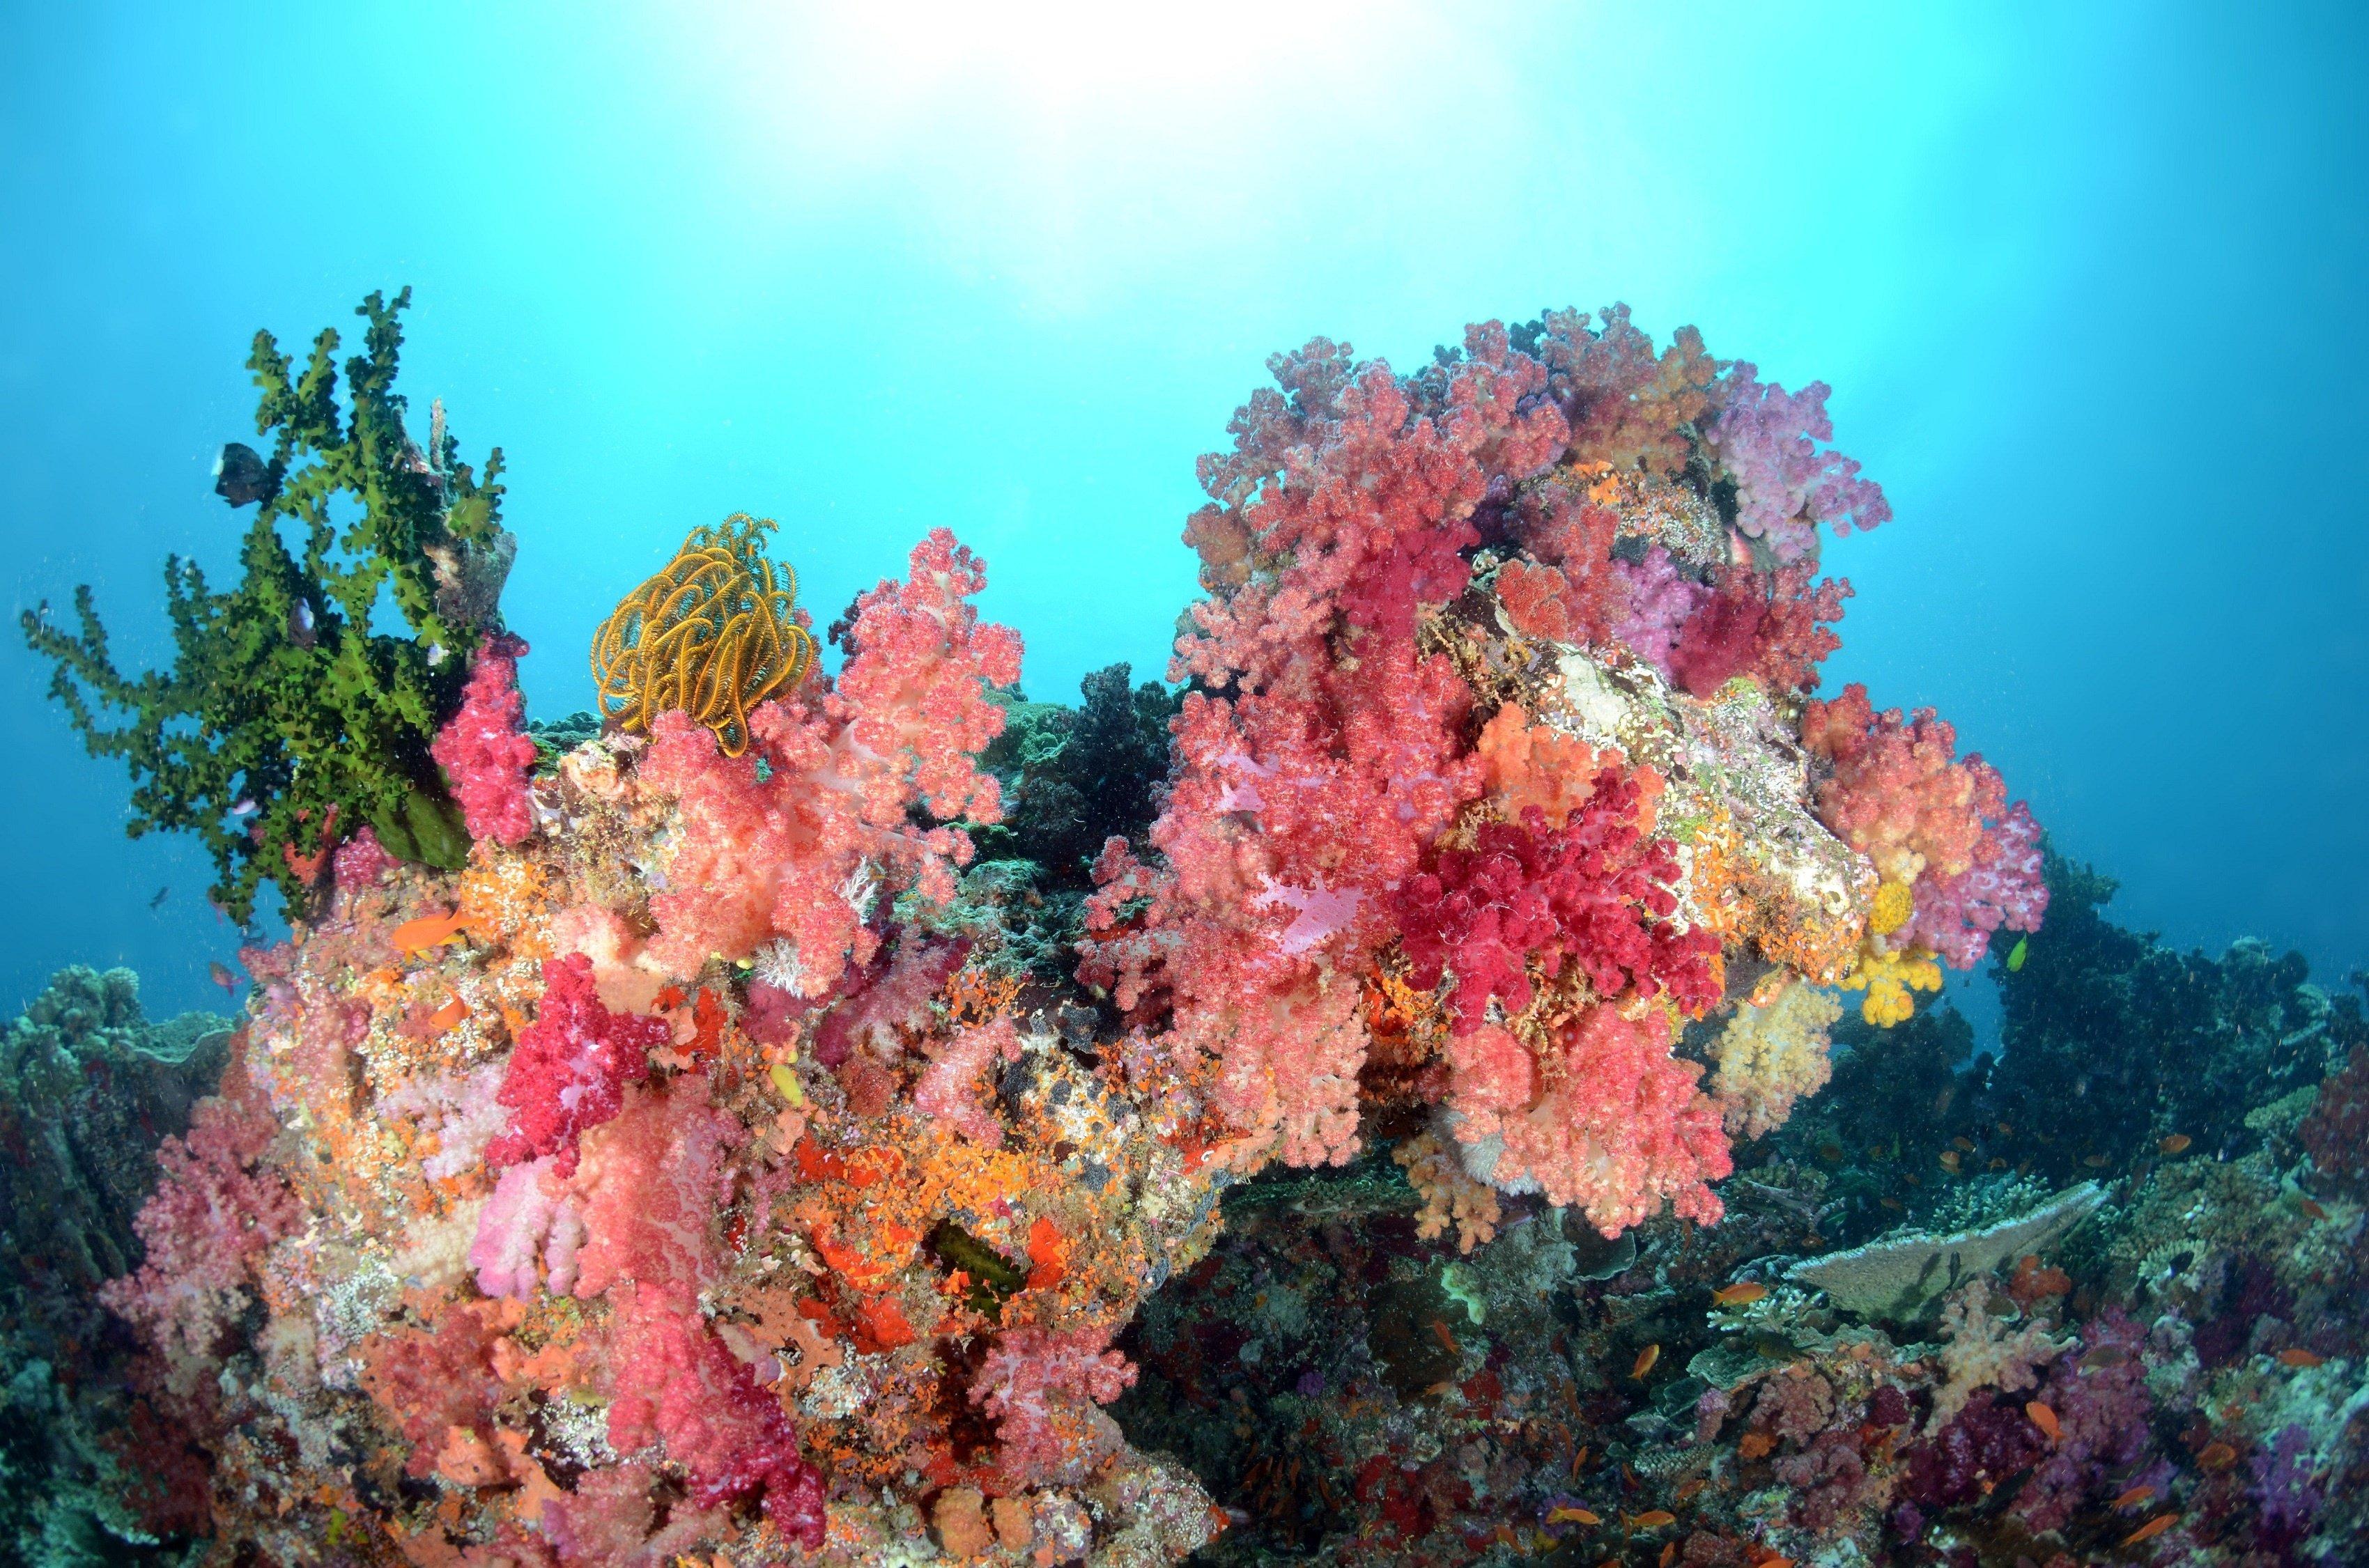 Sea water coral fish fish underwater color ocean wallpaper 3400x2251 3400x2251